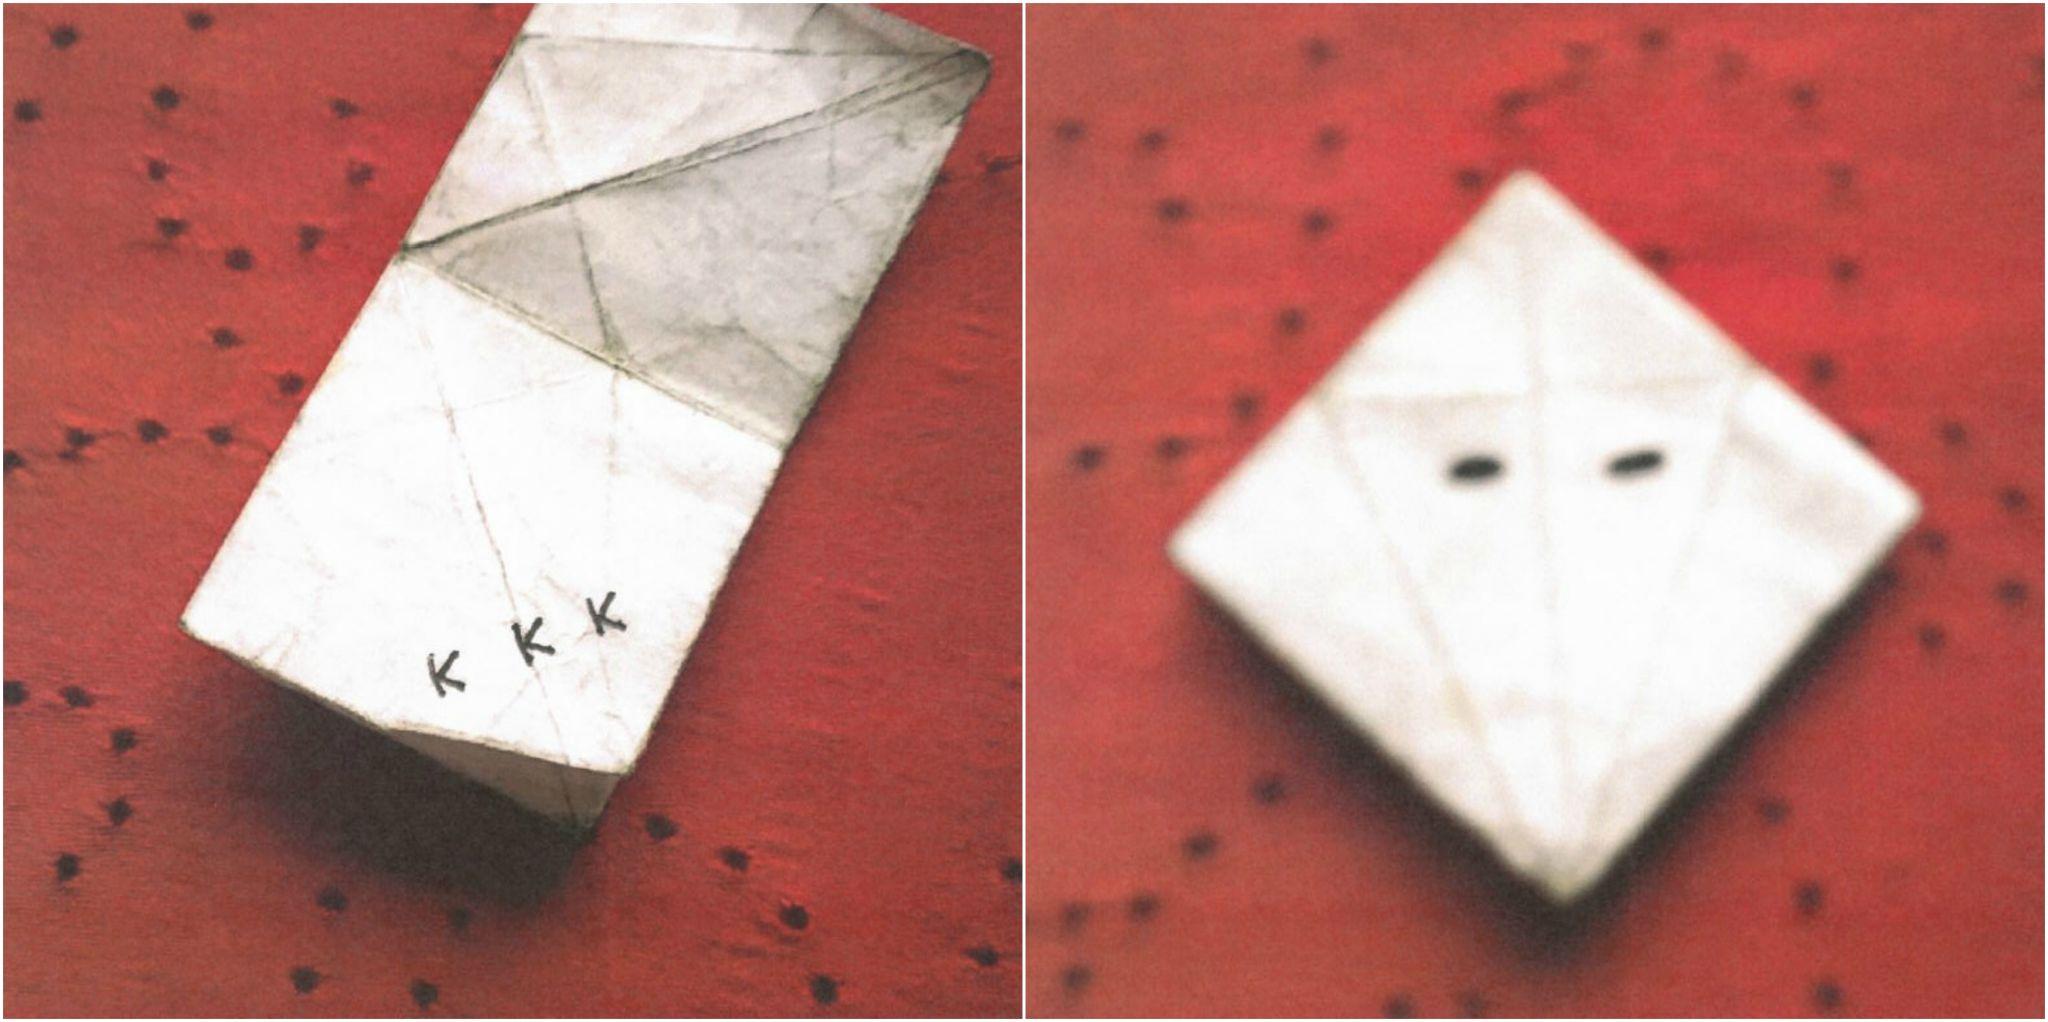 Kkk Origami Case Recalls Use Of Religious Symbols To